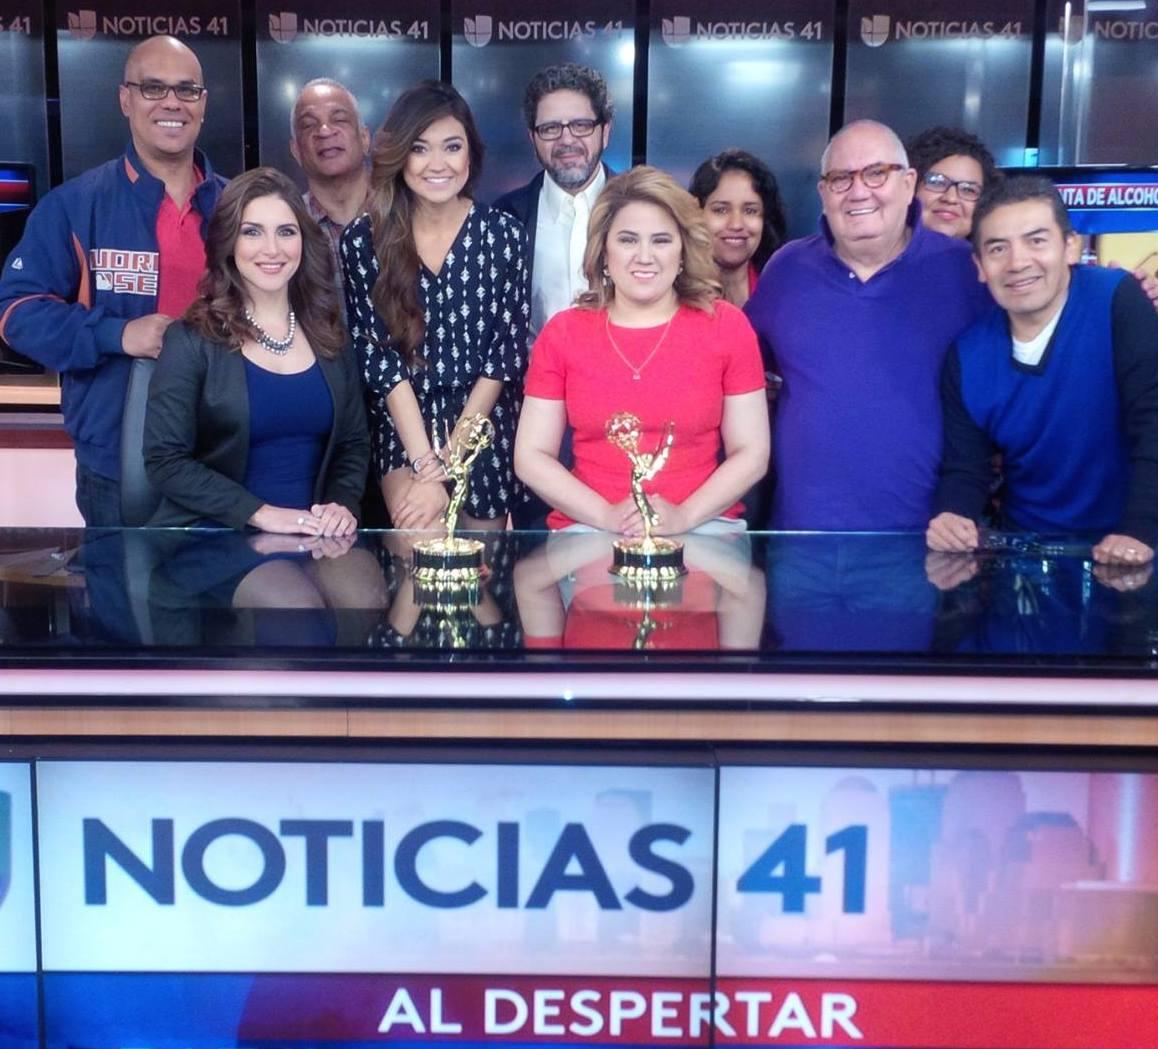 Noticiero Univision Cast